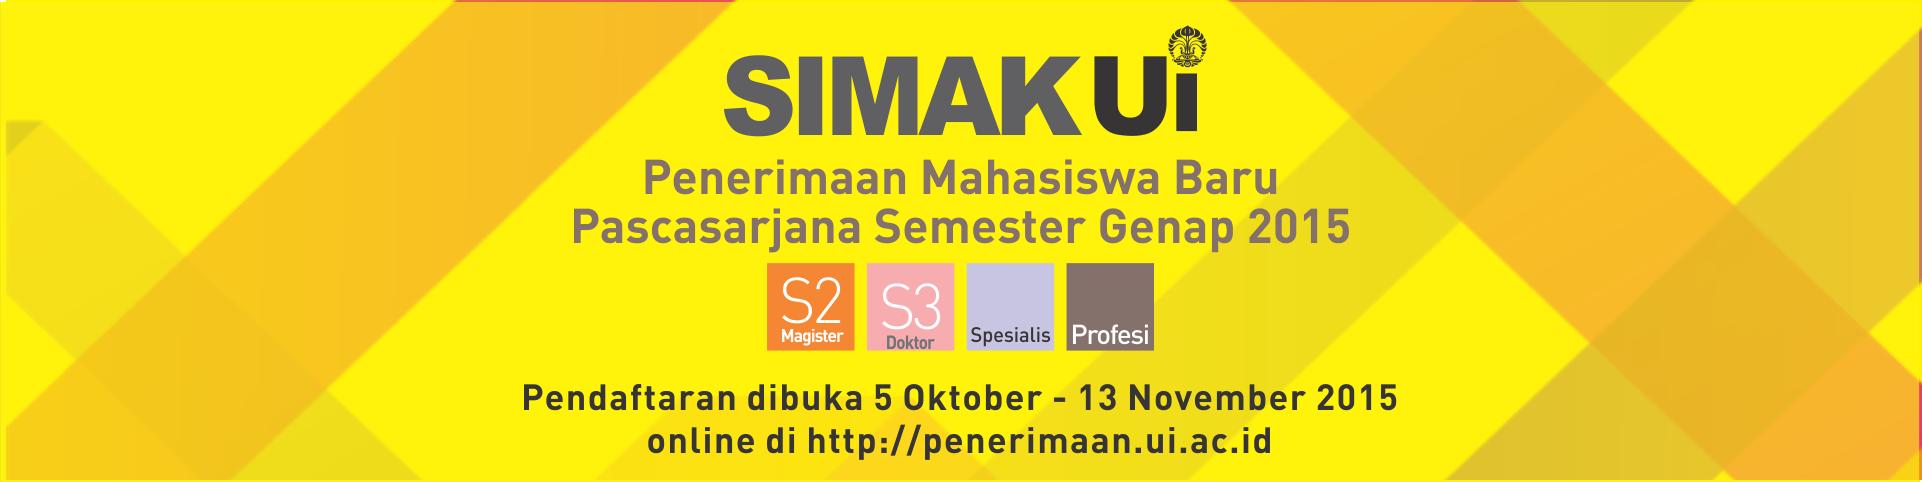 web-banner-pendaftaran-Pasca